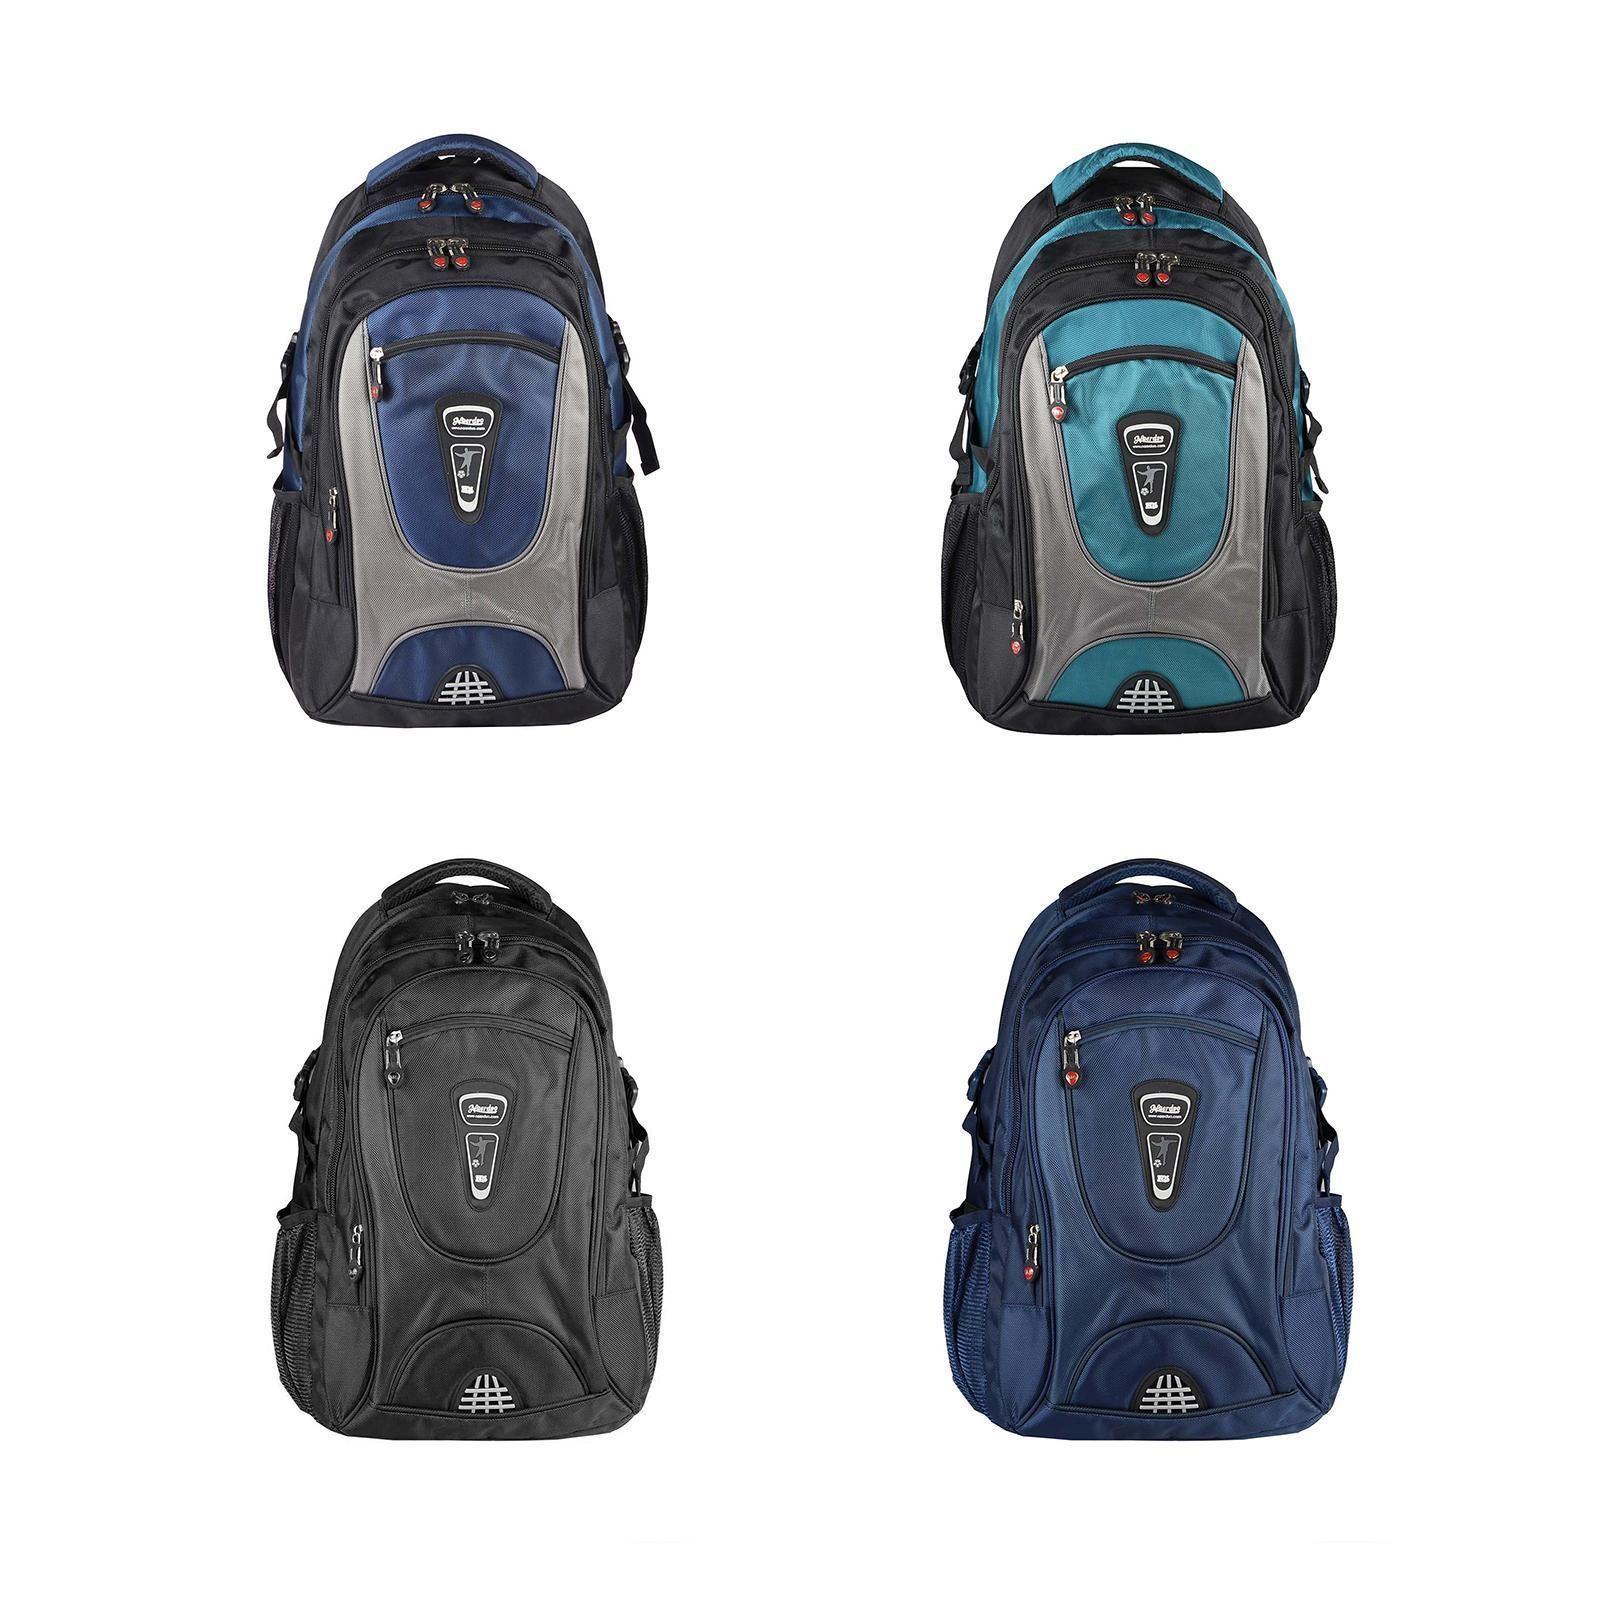 Xxl Rucksack Herren Daypack Backpack Laptoprucksack Notebook